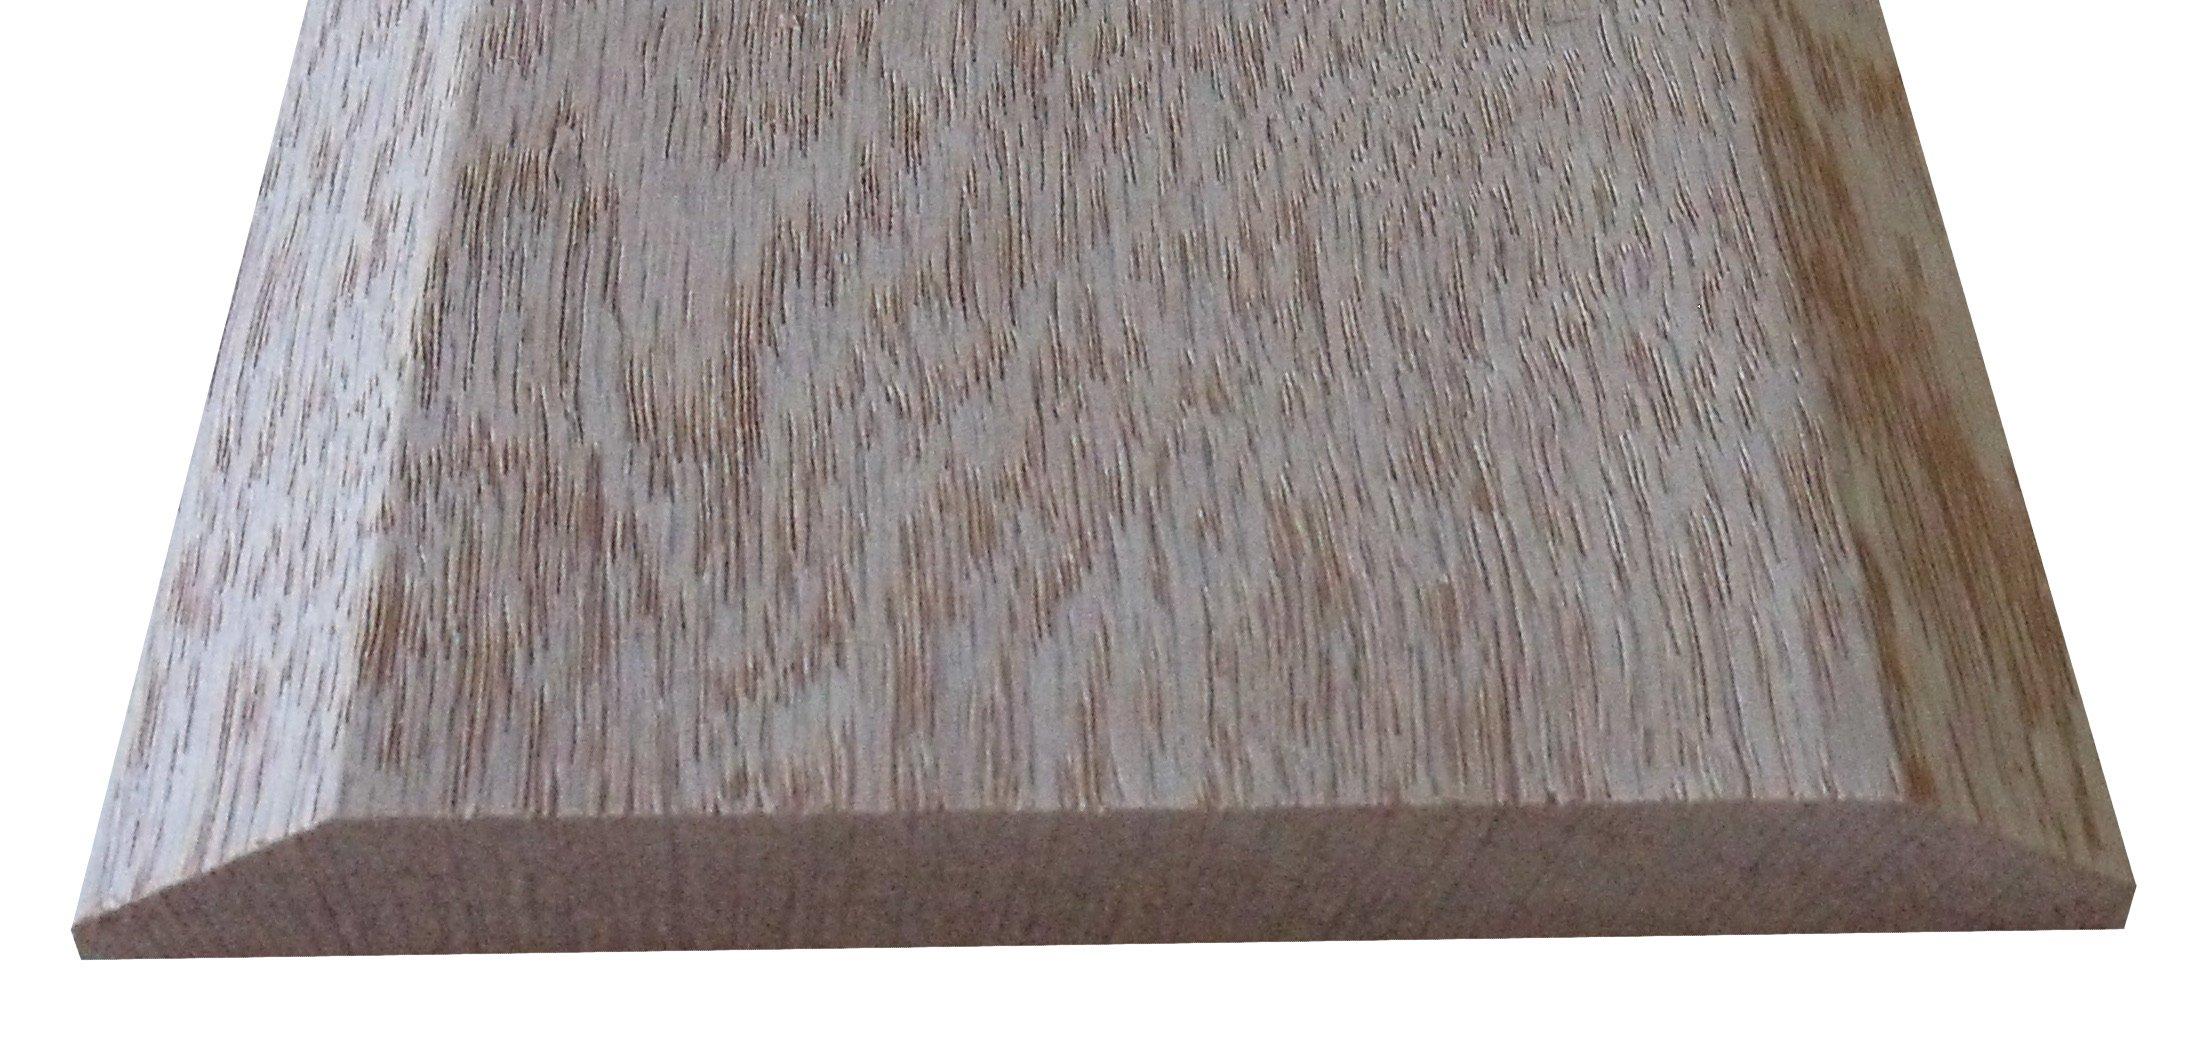 ADA 1/2'' Solid Hardwood Interior Threshold in Red Oak (6 1/2'' x 36'')